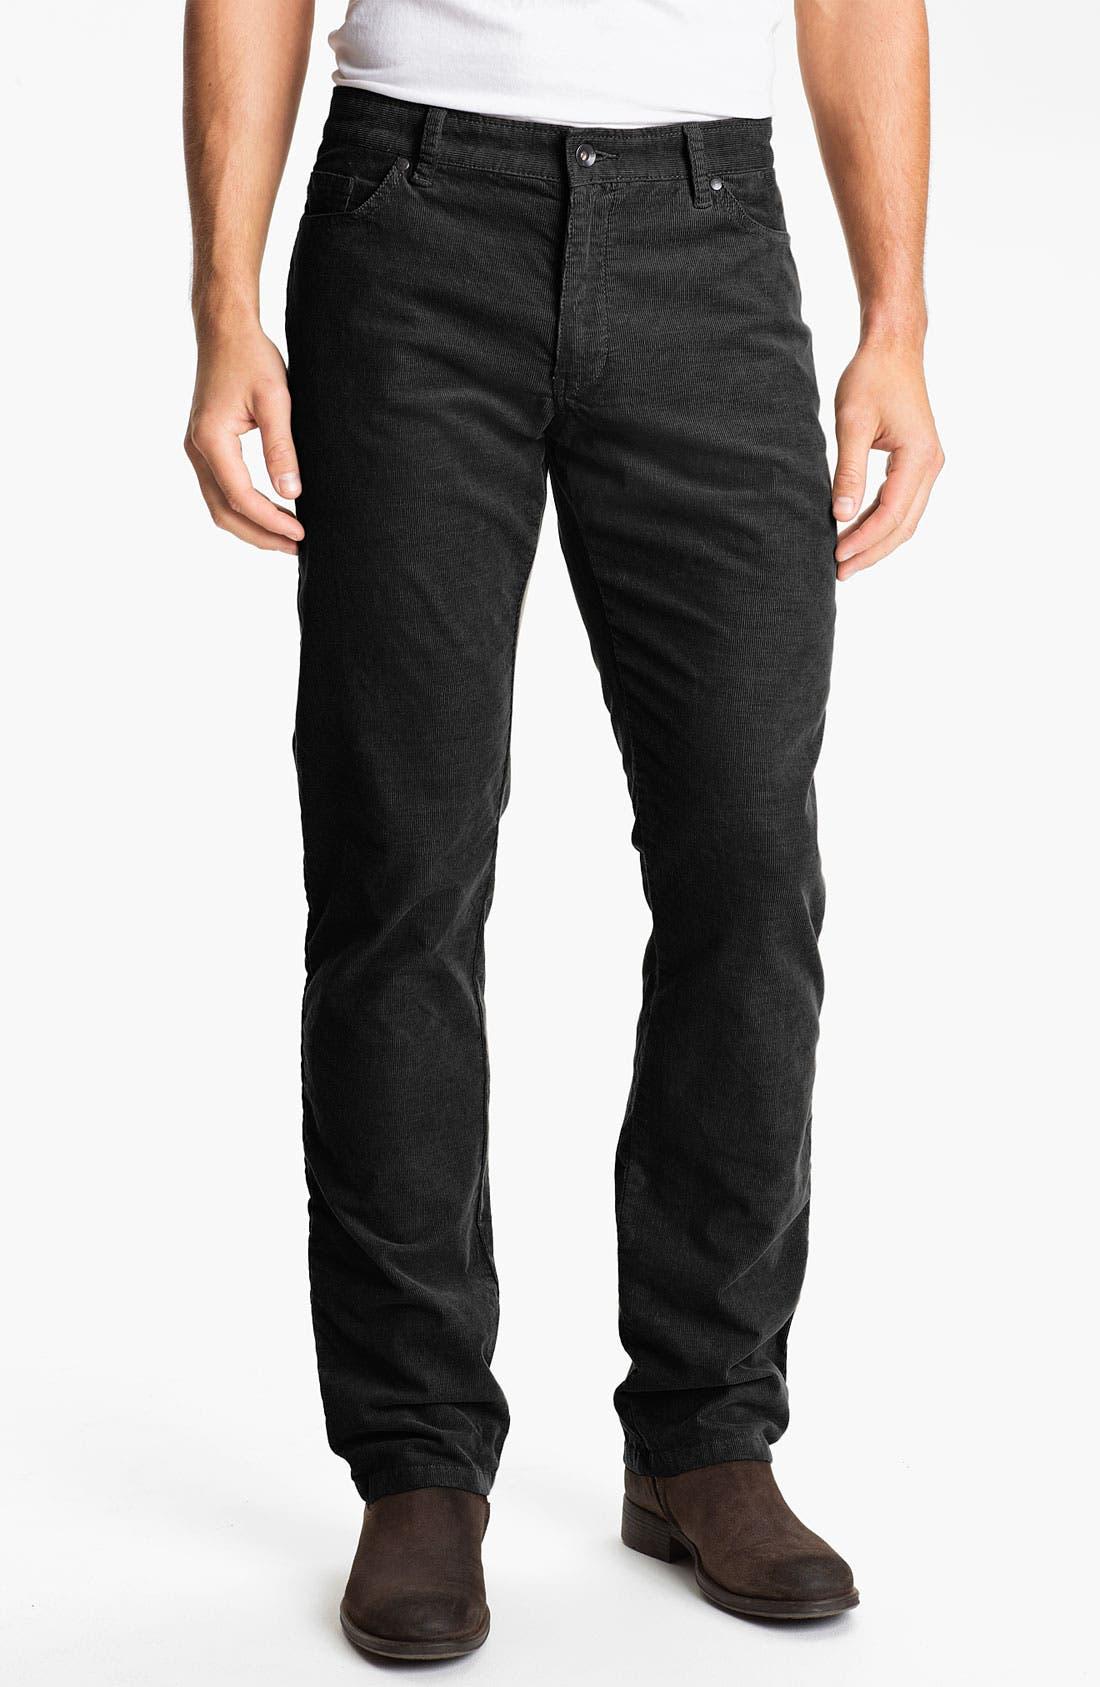 Alternate Image 1 Selected - Victorinox Swiss Army® 'Berne' Corduroy Pants